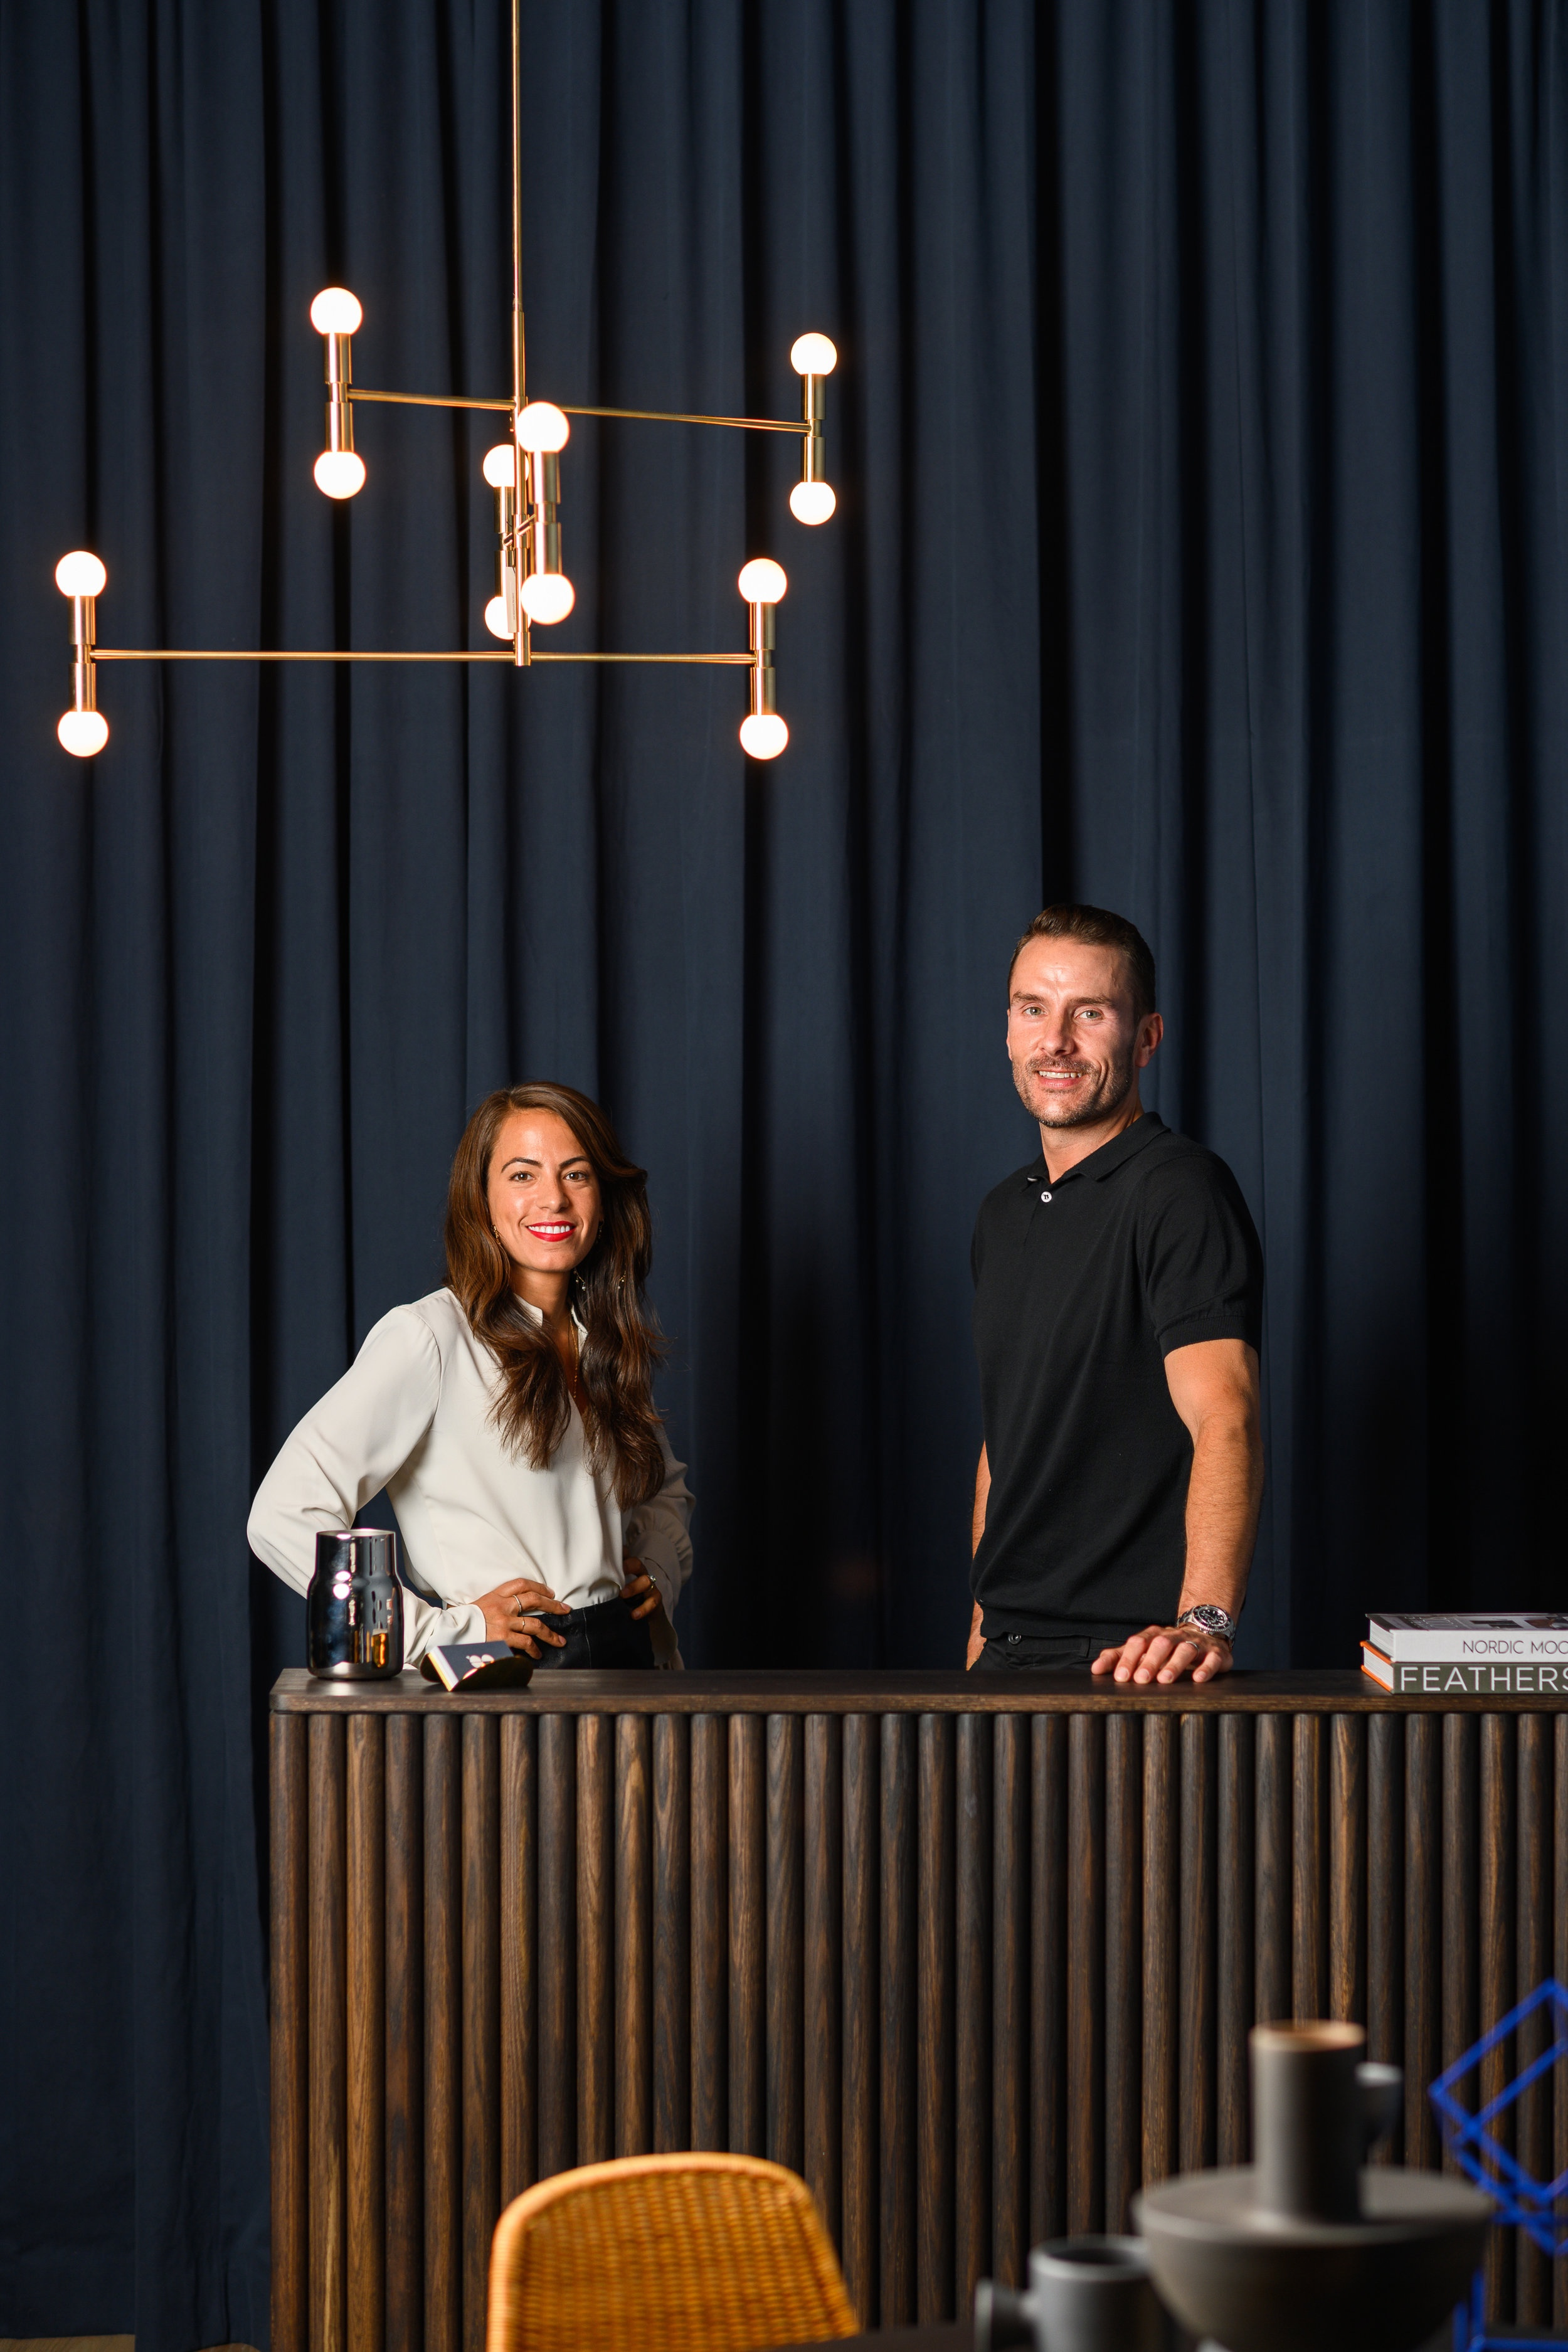 Founders Karolina Dabo and Adrian Pollack